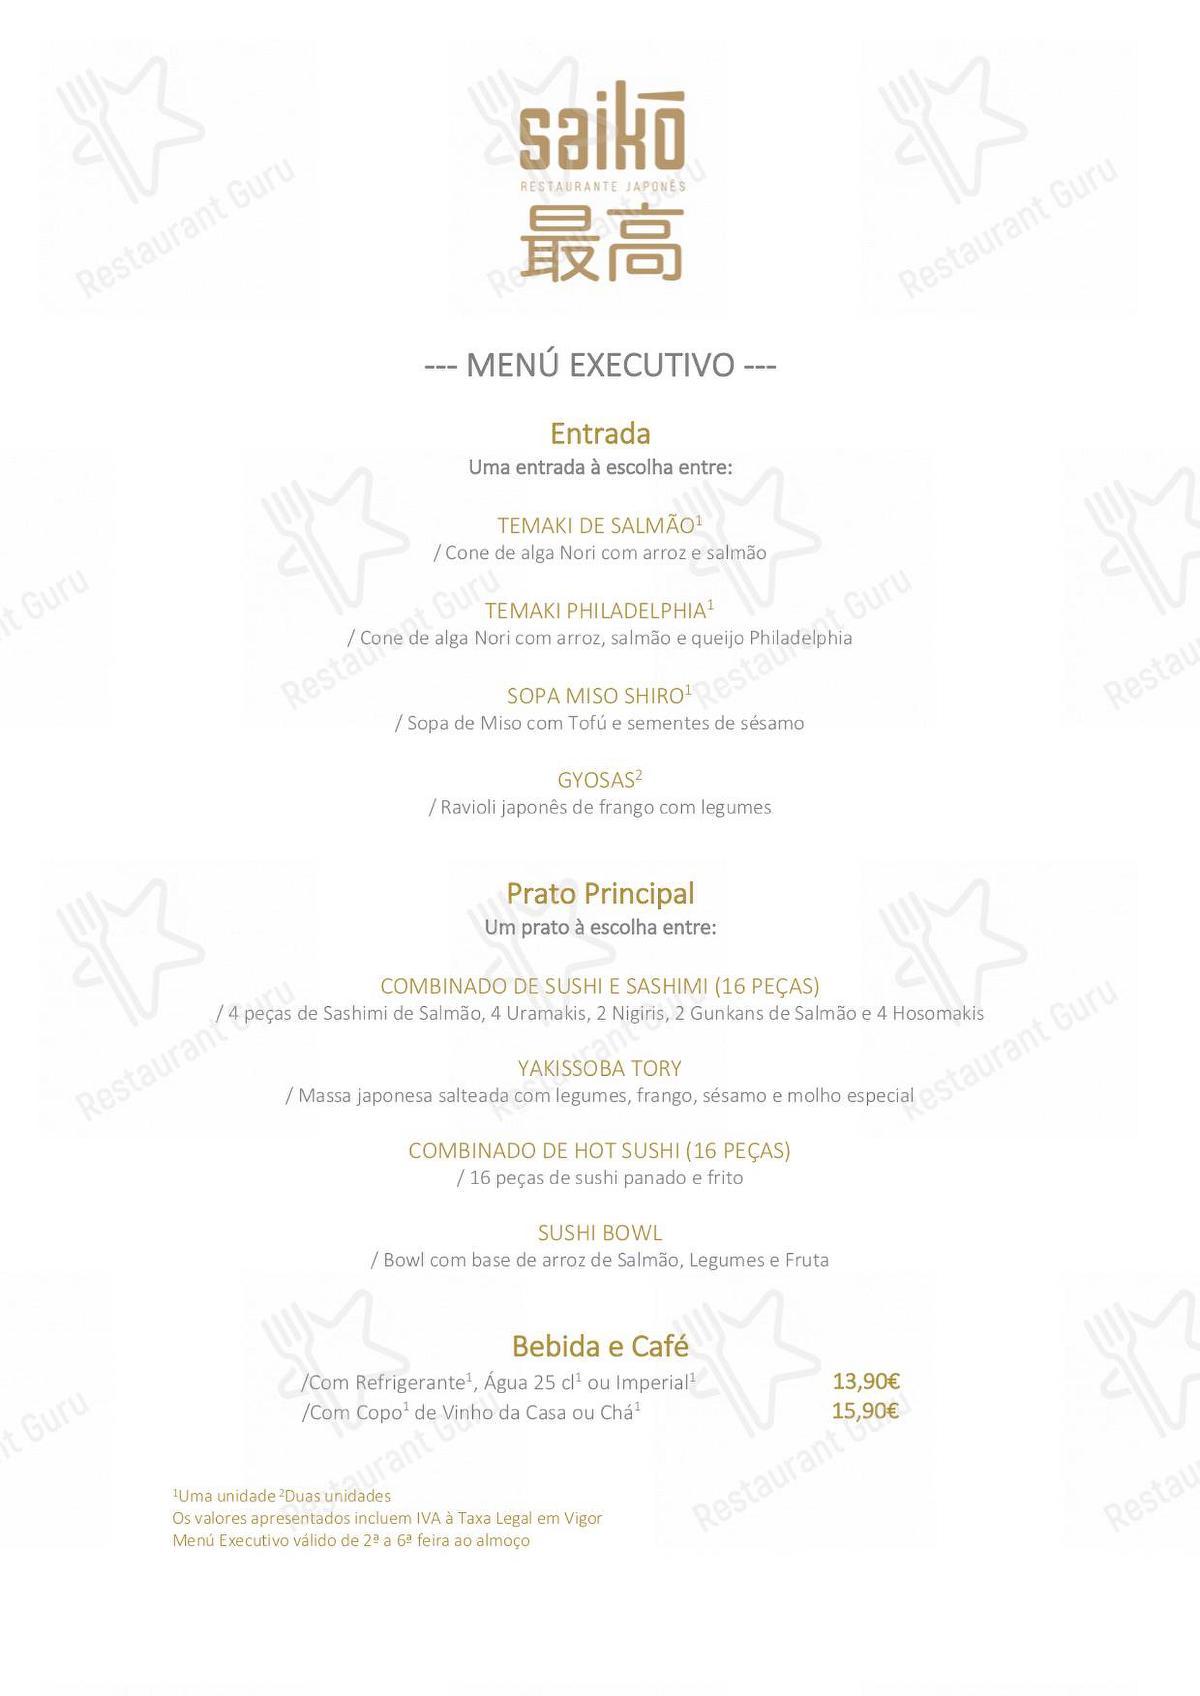 Saikō menu - meals and drinks